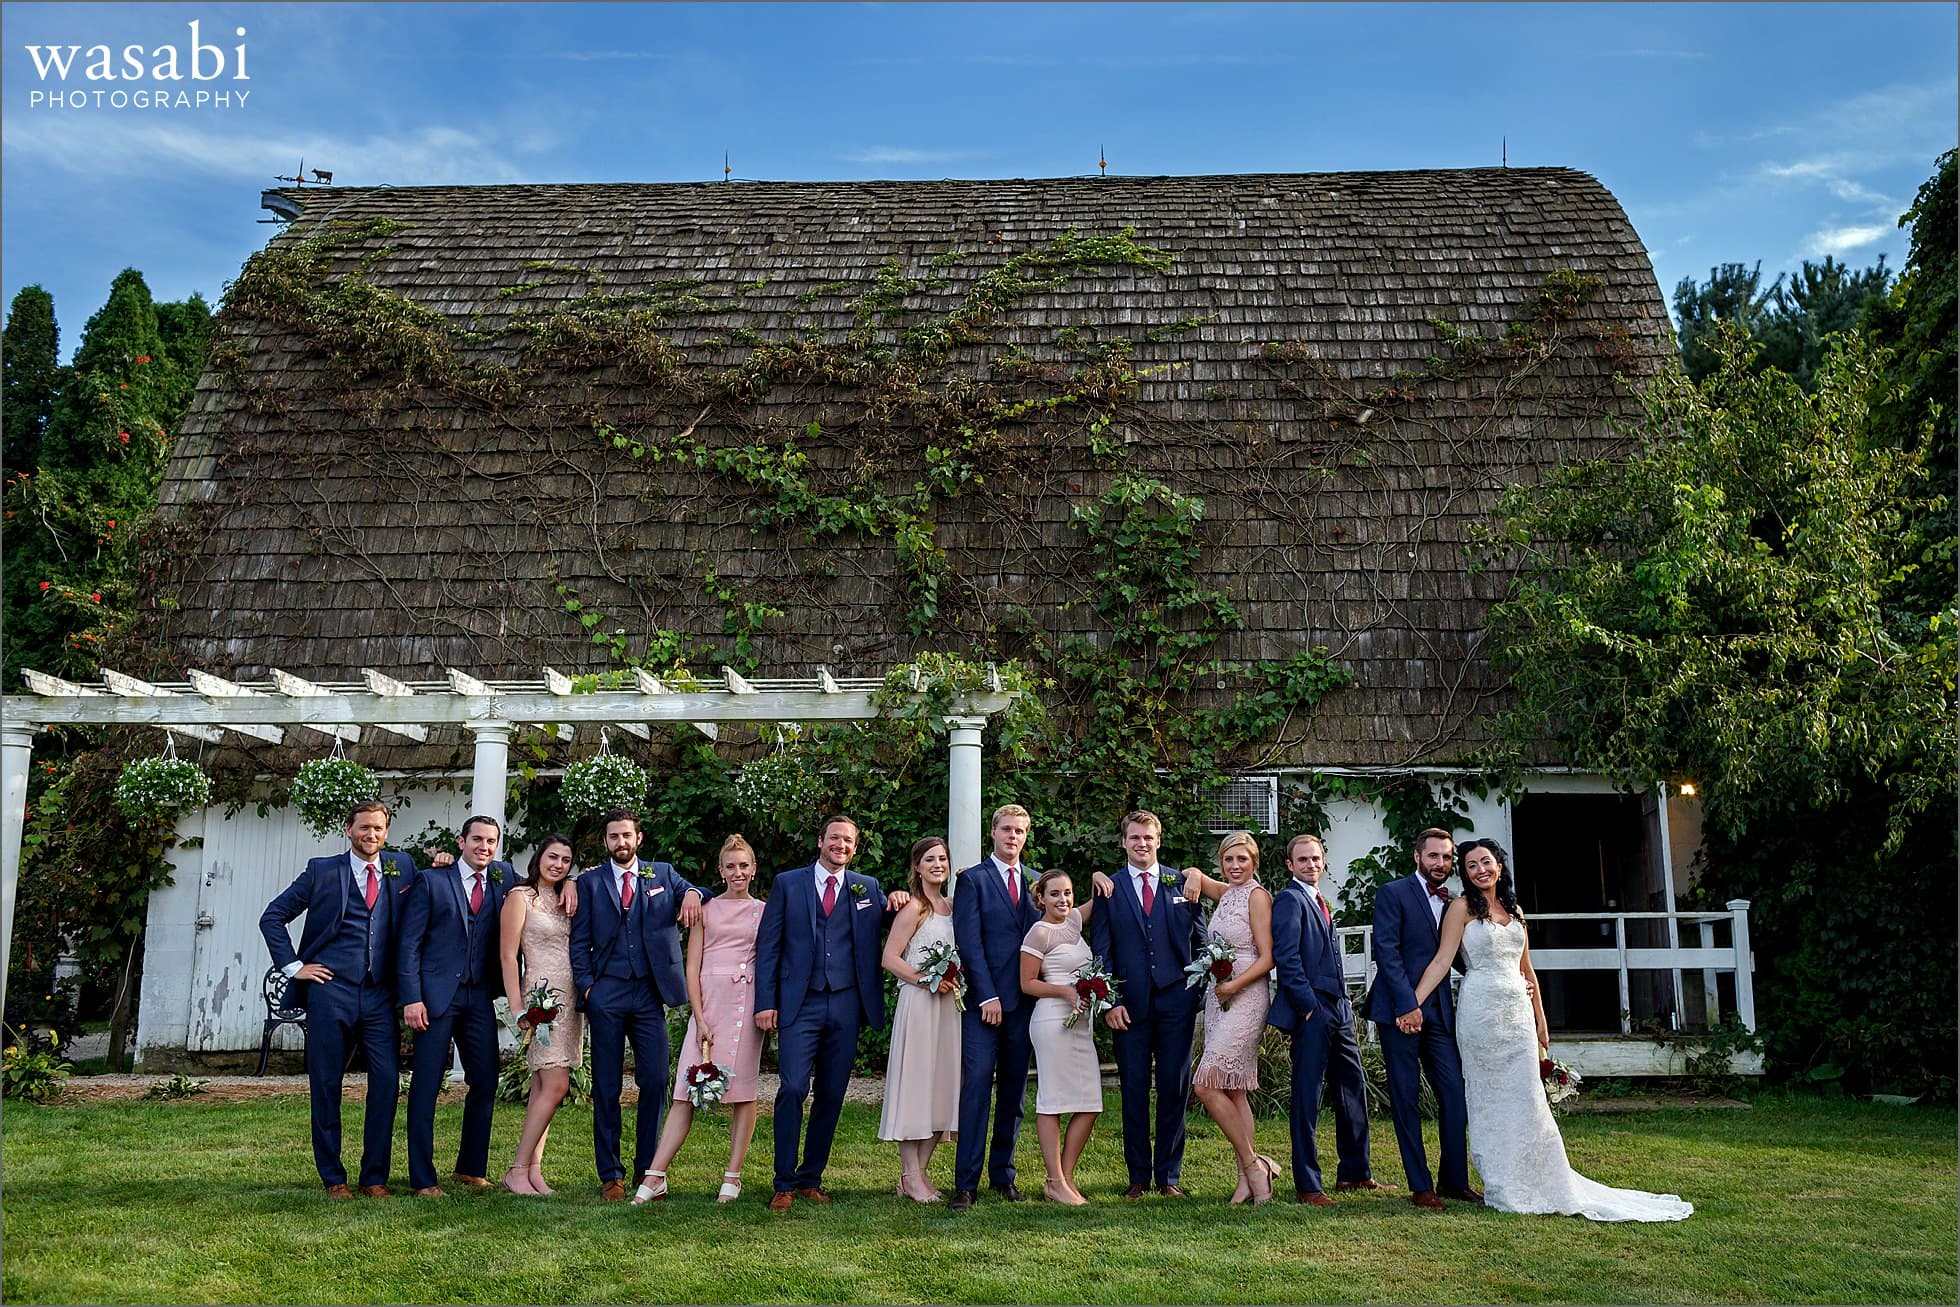 willow harbor vineyards barn wedding party photo